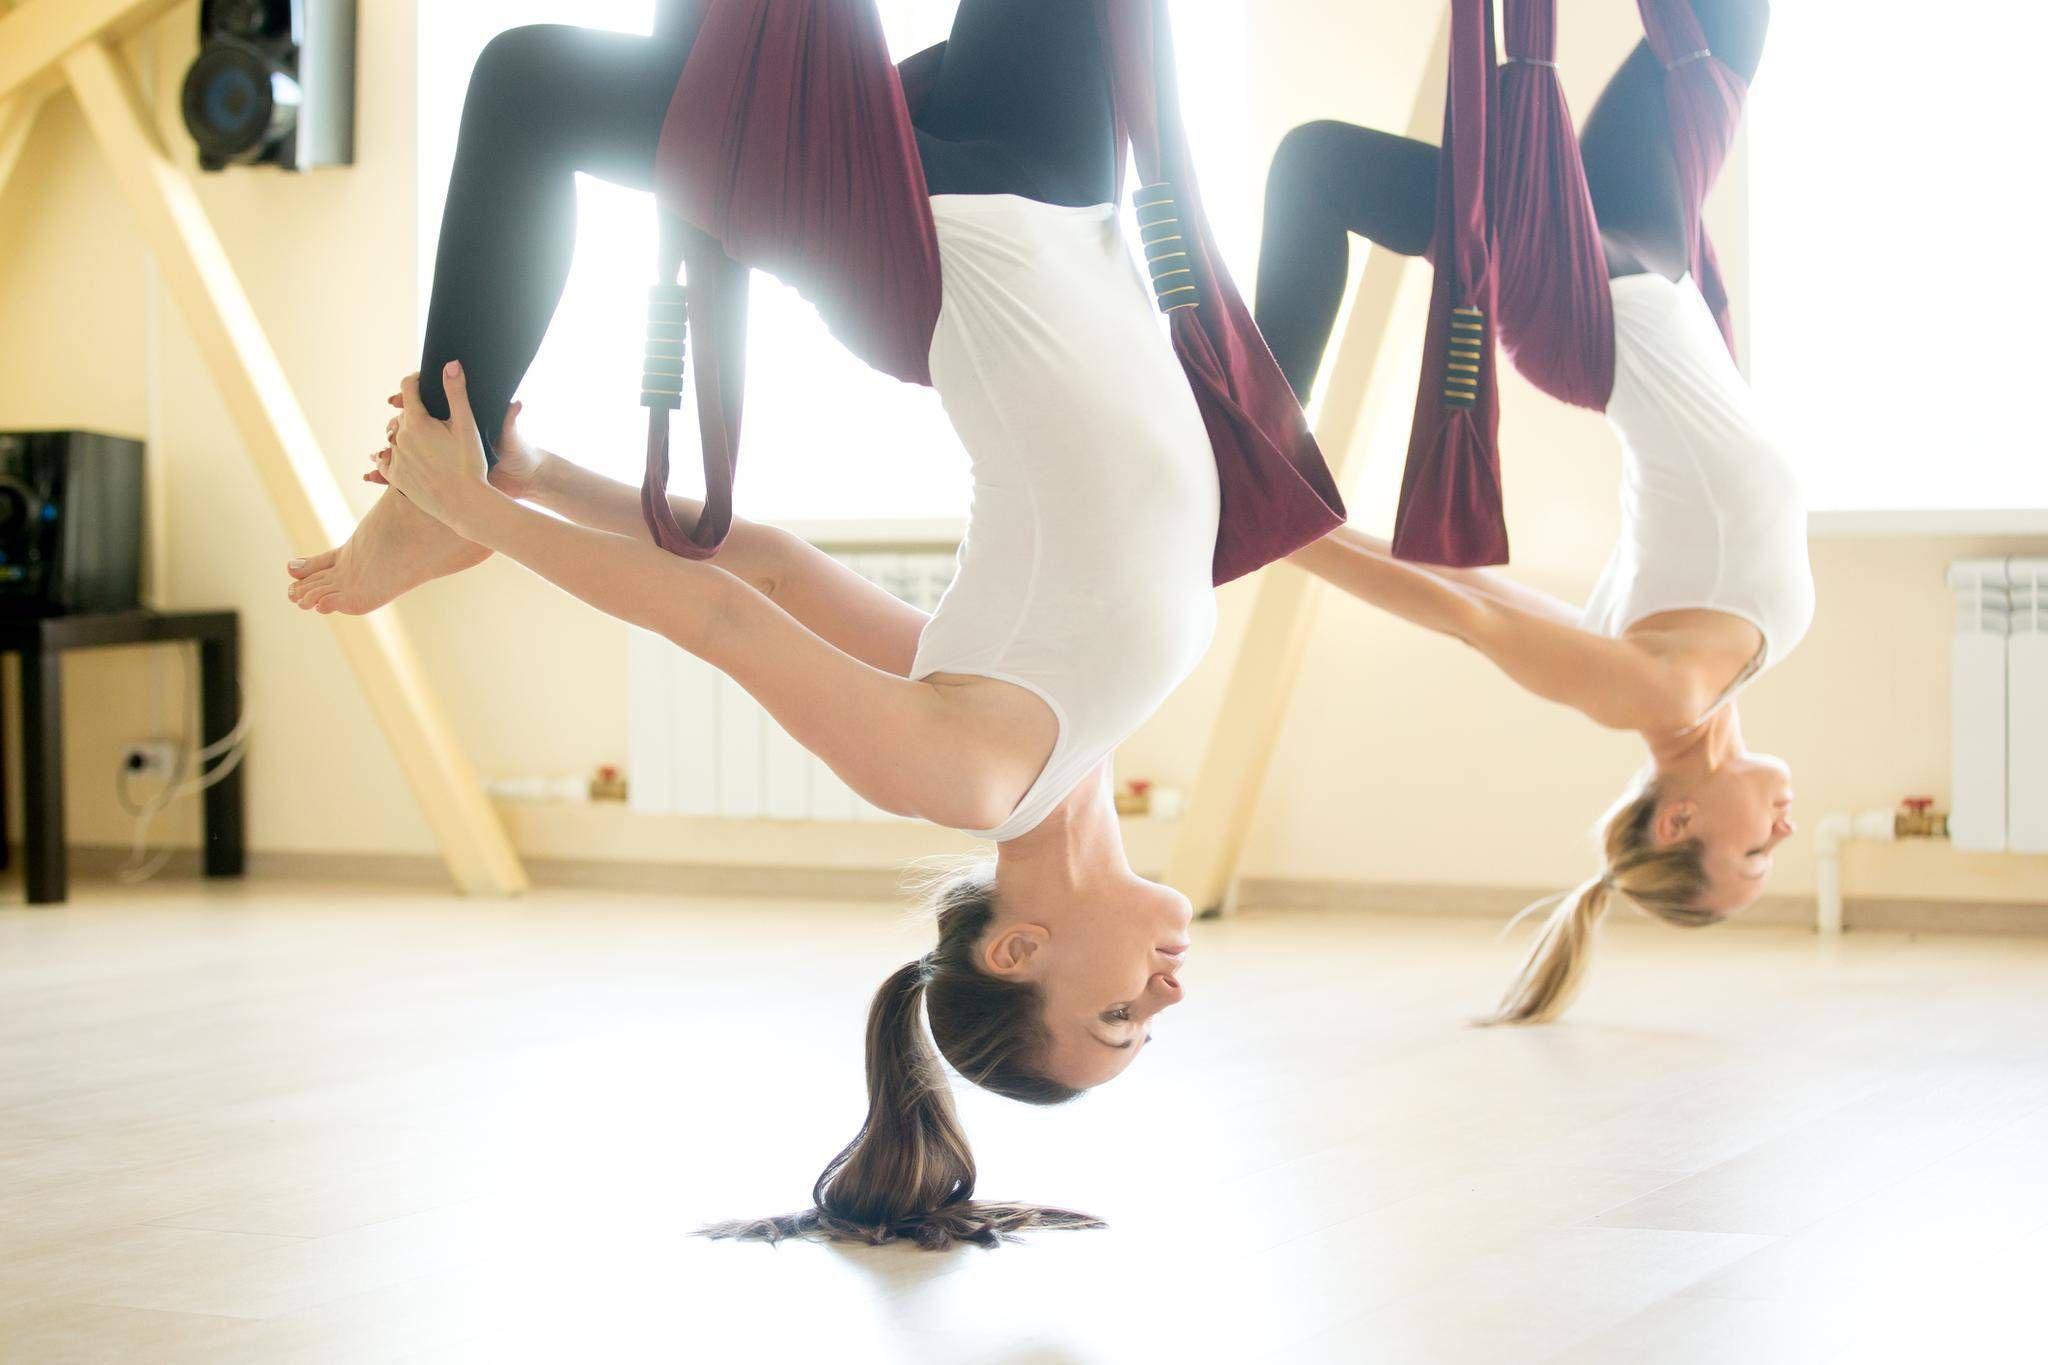 aerial yoga的圖片搜尋結果